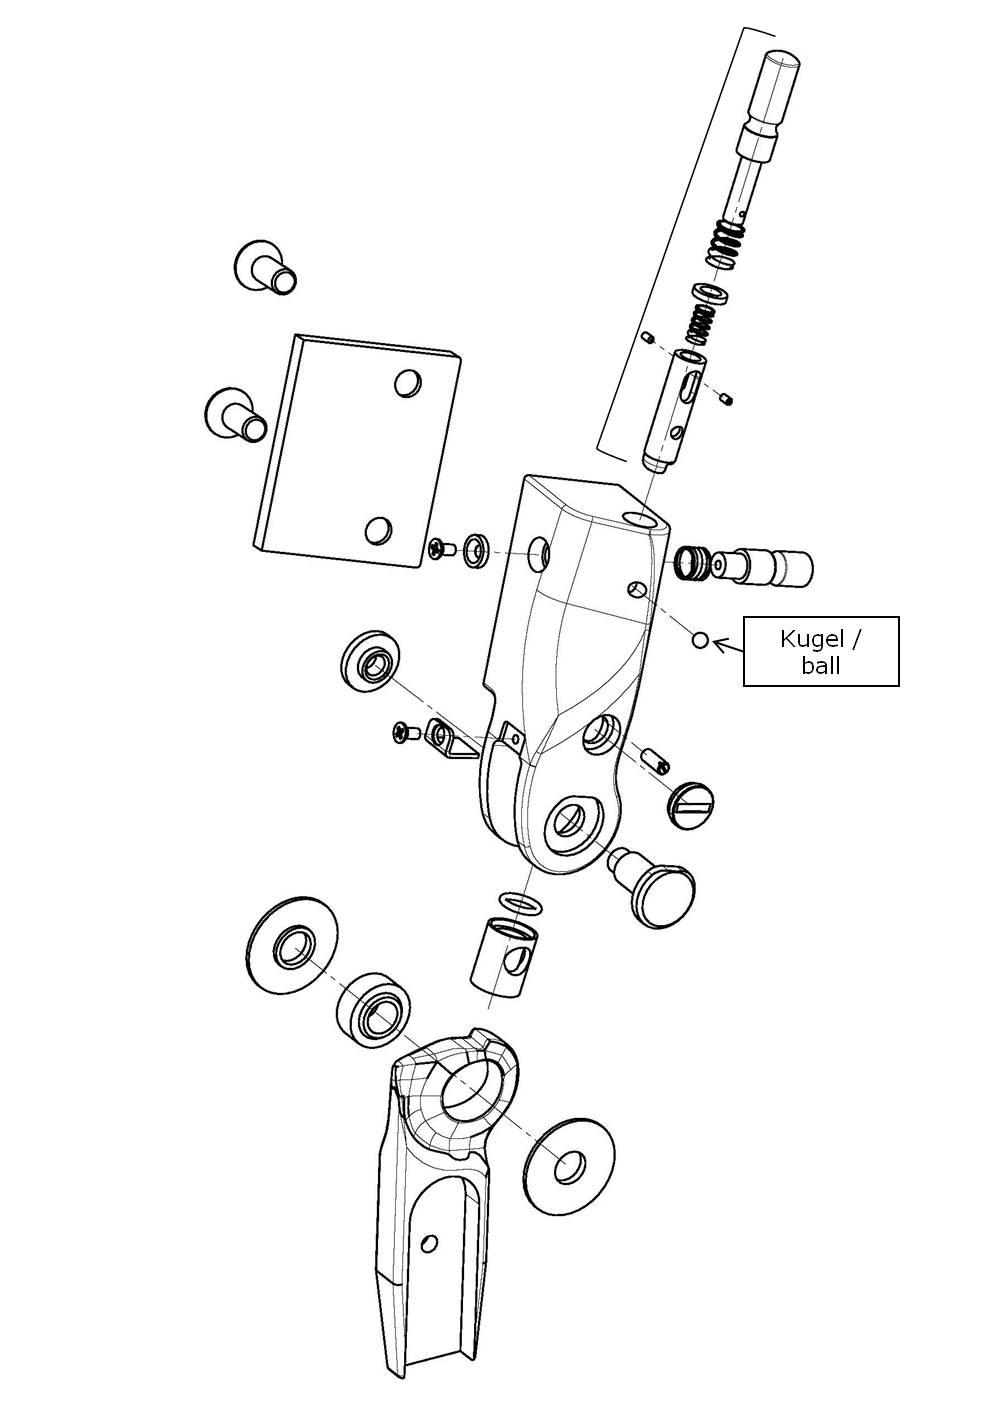 Kugel für das Salera preselect 3-D Hüftgelenk